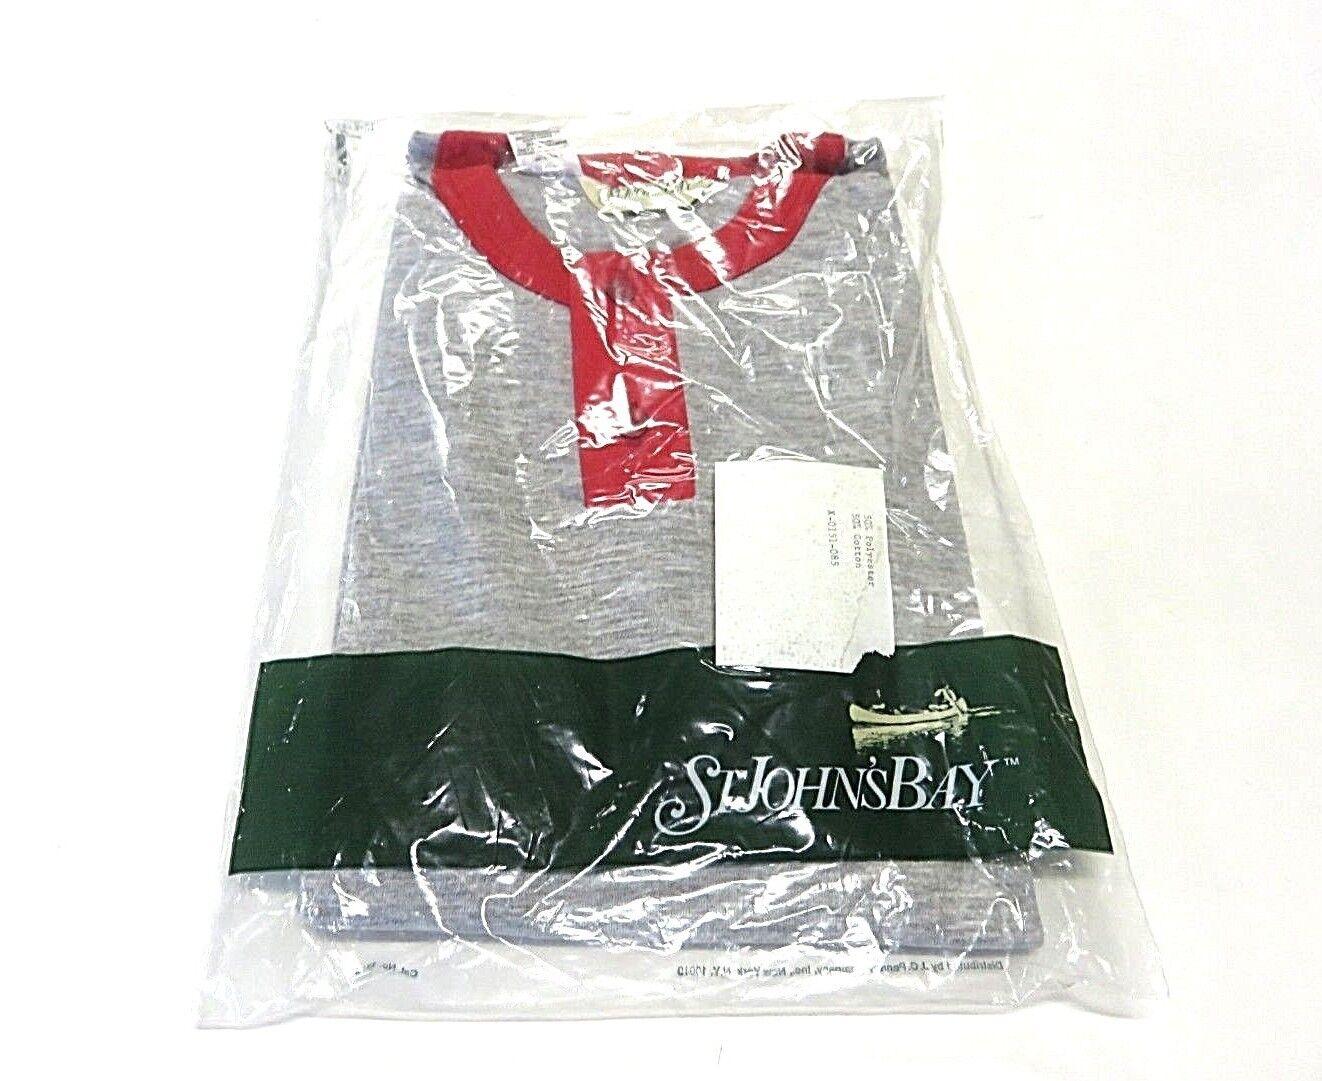 NWT St. John's Bay Grey & Red 1 4 Button Shirt Men's Size 56 58 H Big Sizes